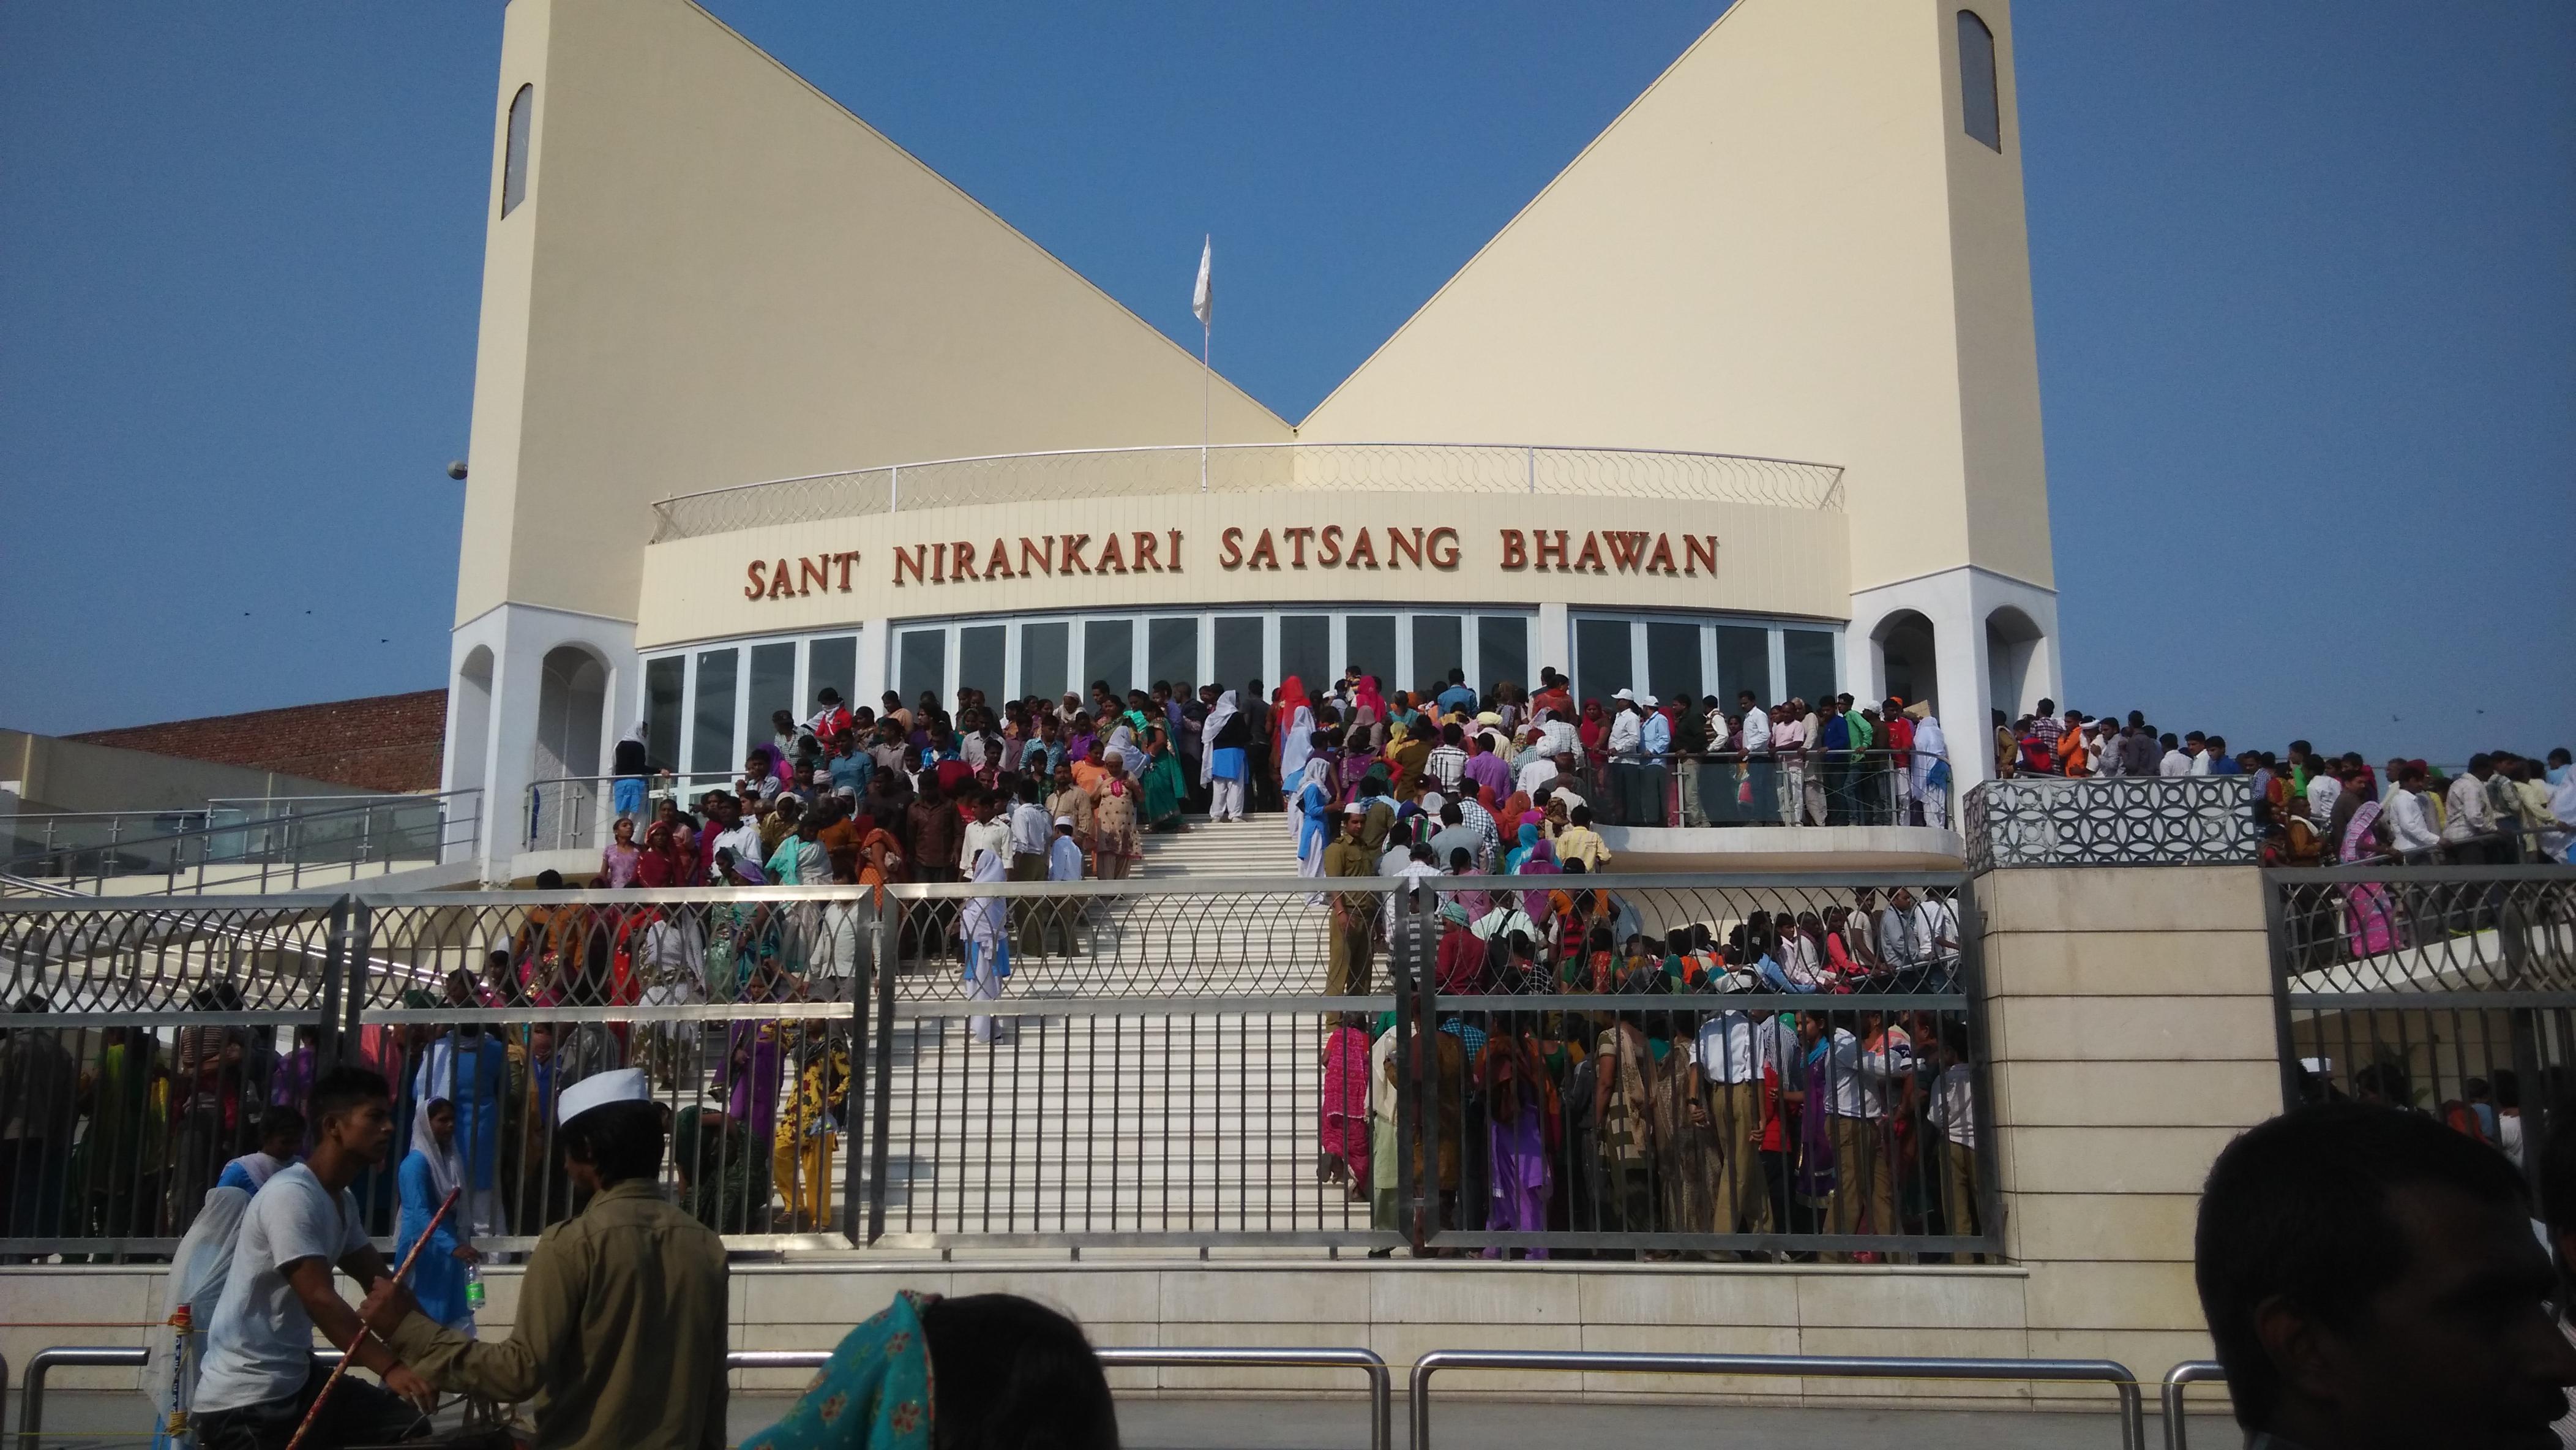 Sant Nirankari Mission - Wikipedia